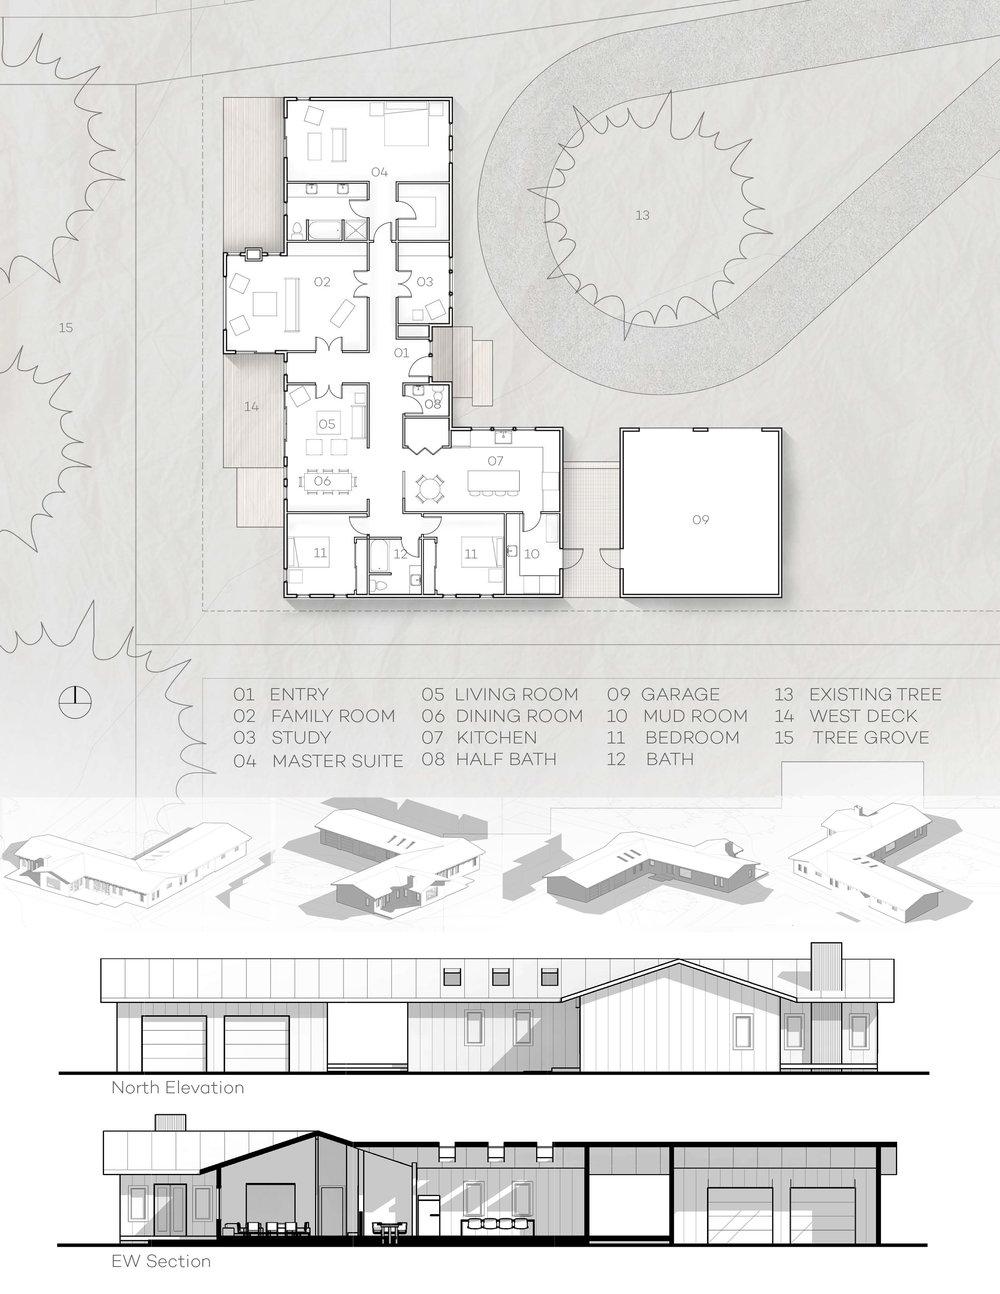 Lot 9 Illustrated Floor Plan.jpg